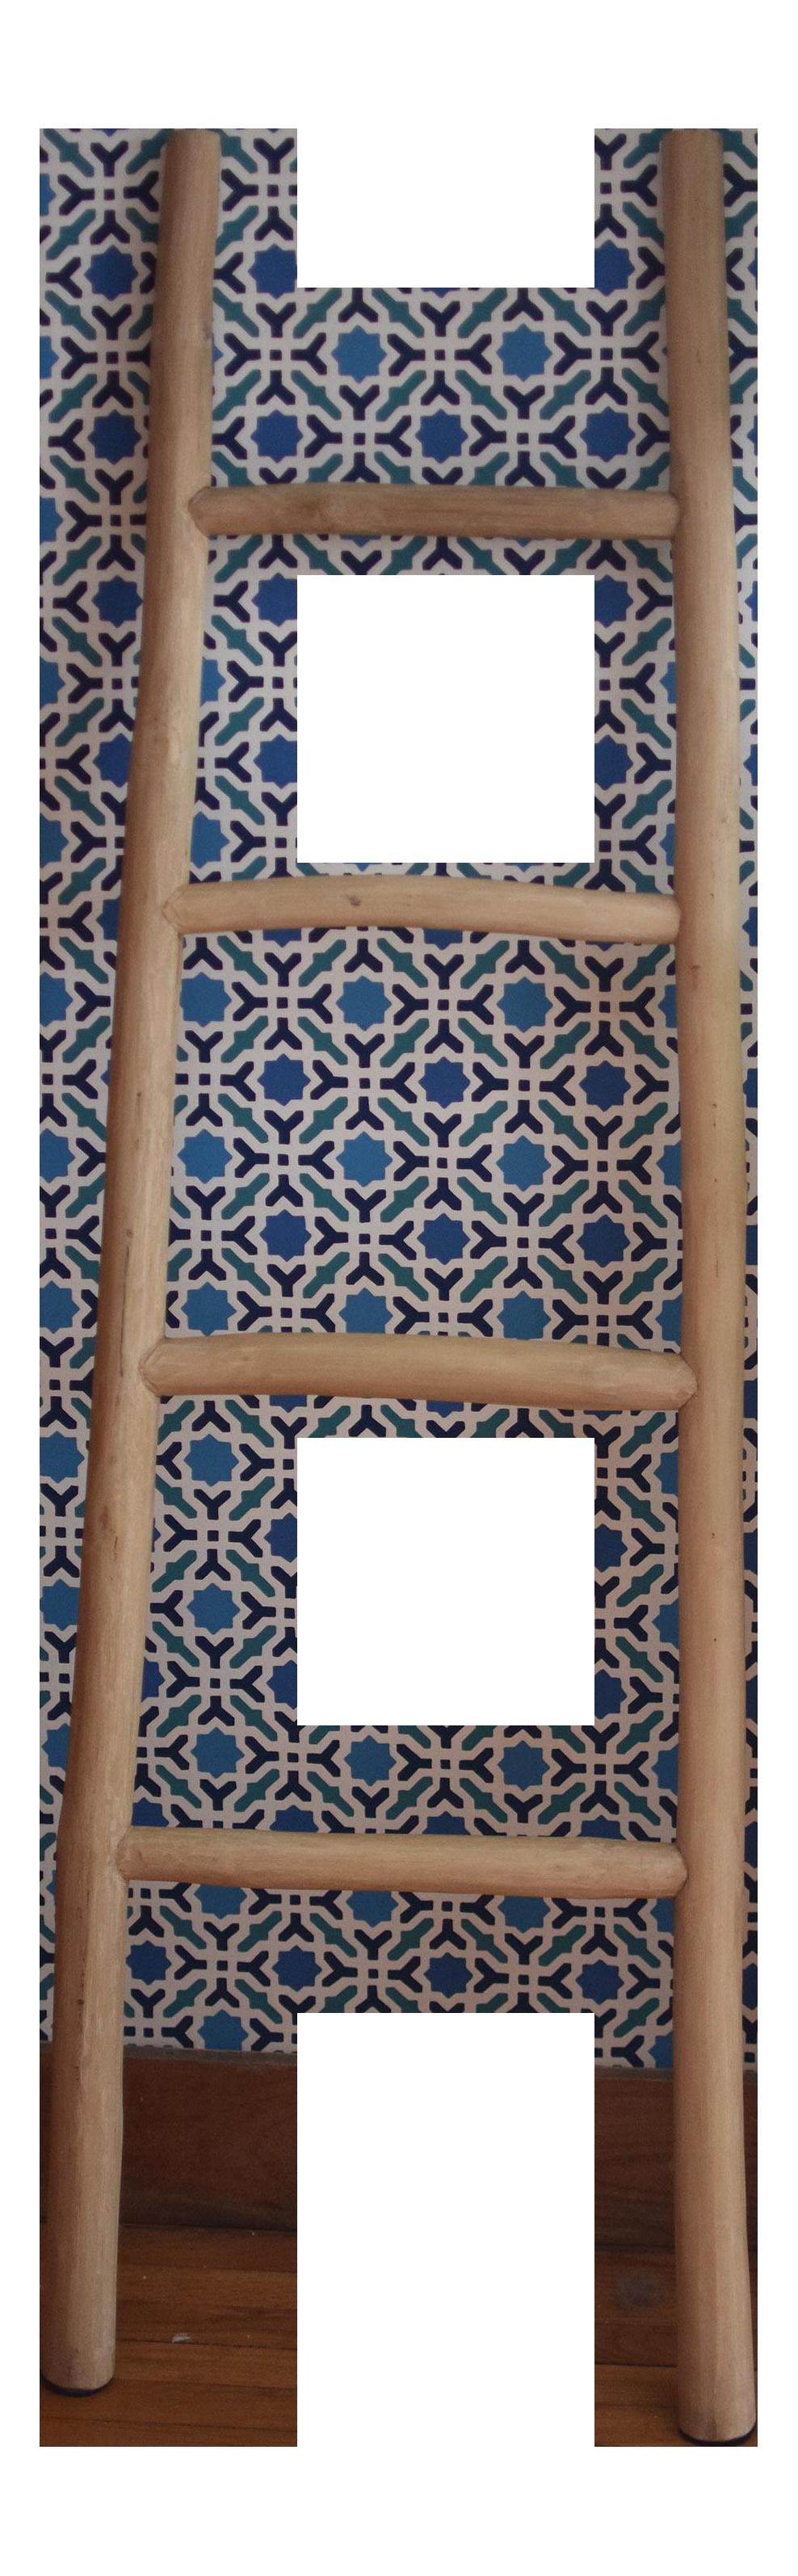 Ladder clipart wood ladder.  amazing wooden decorative